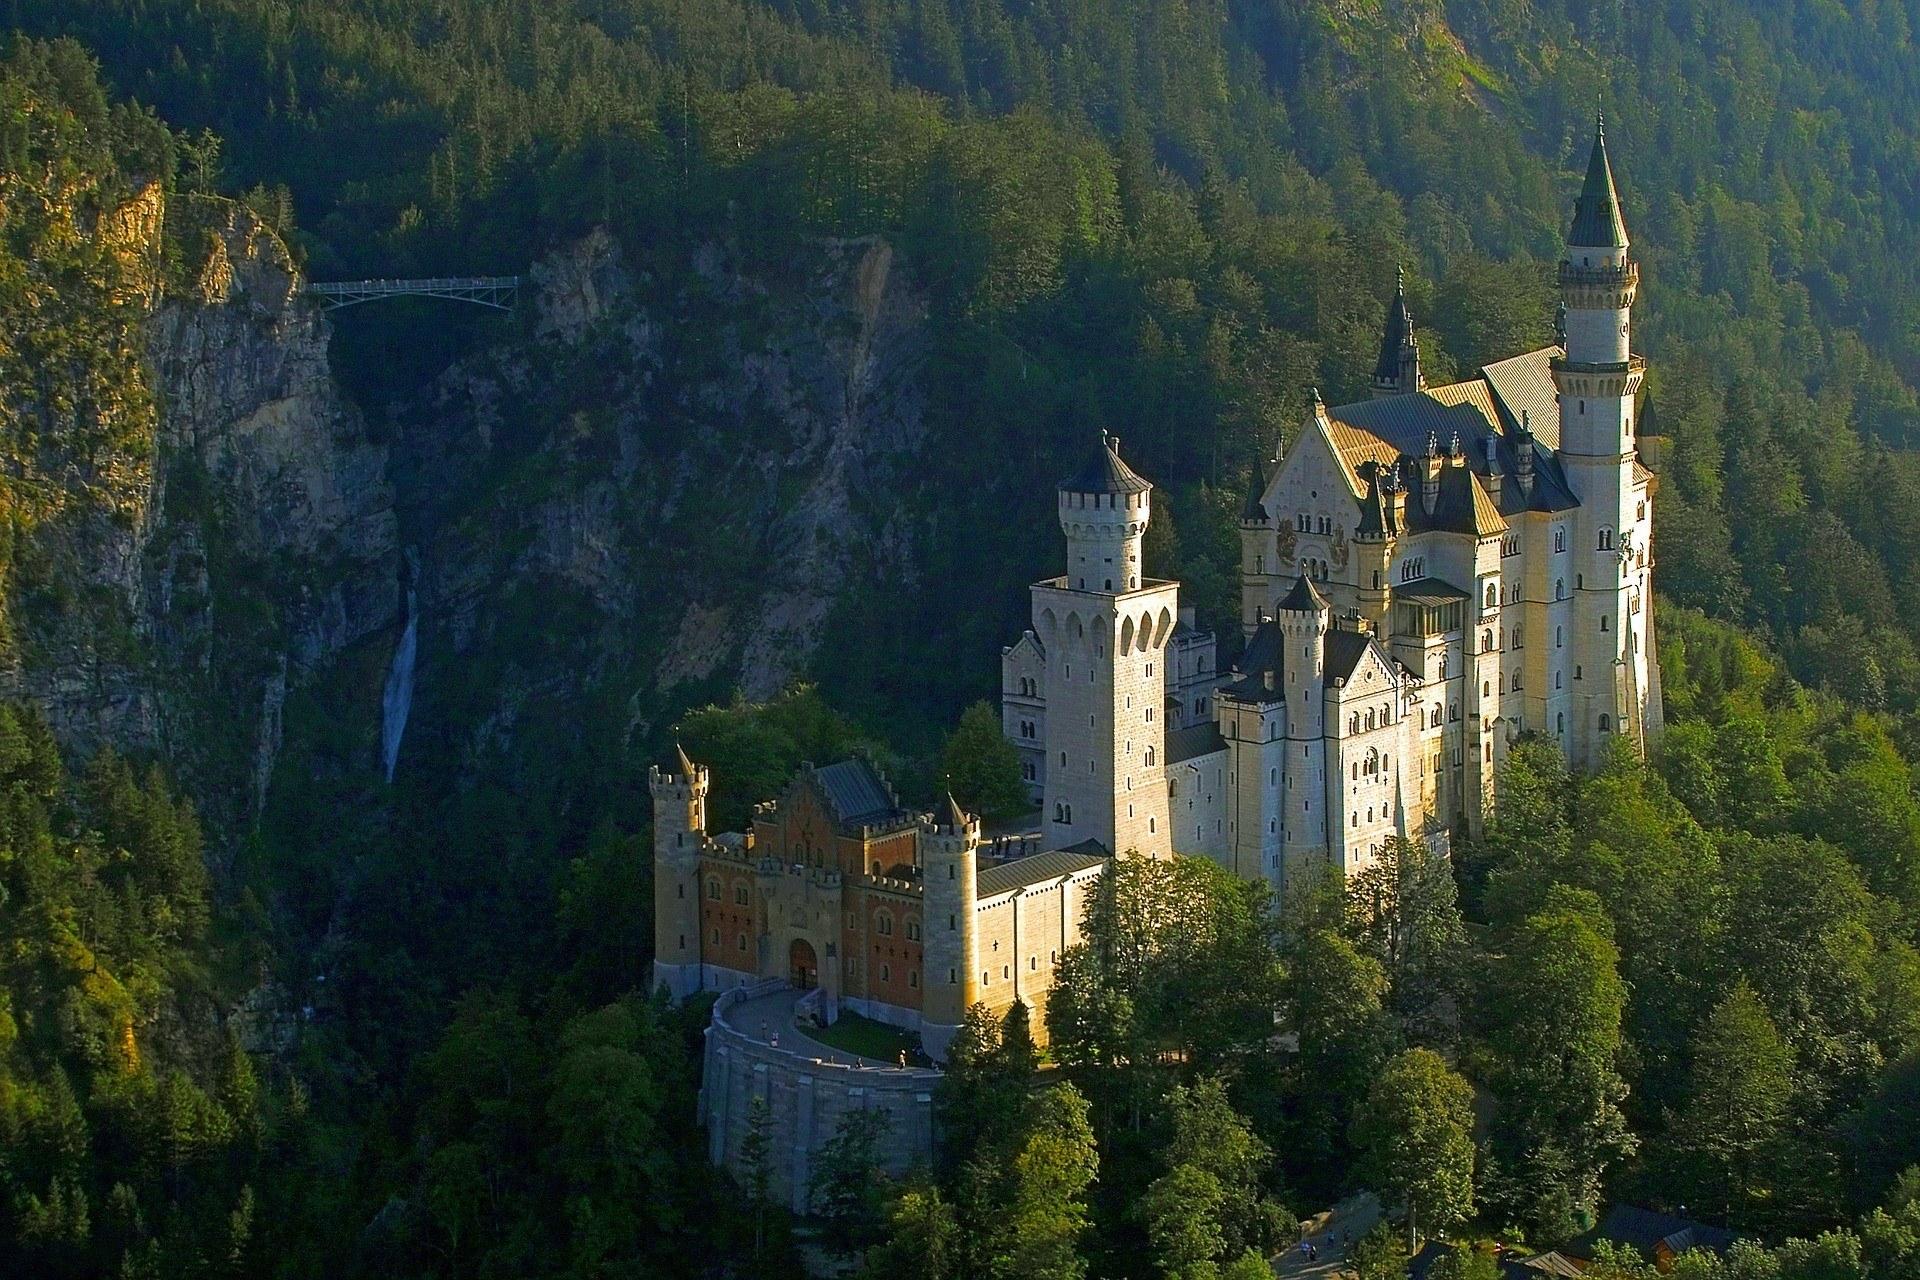 Verlassenes Schloss Bayern